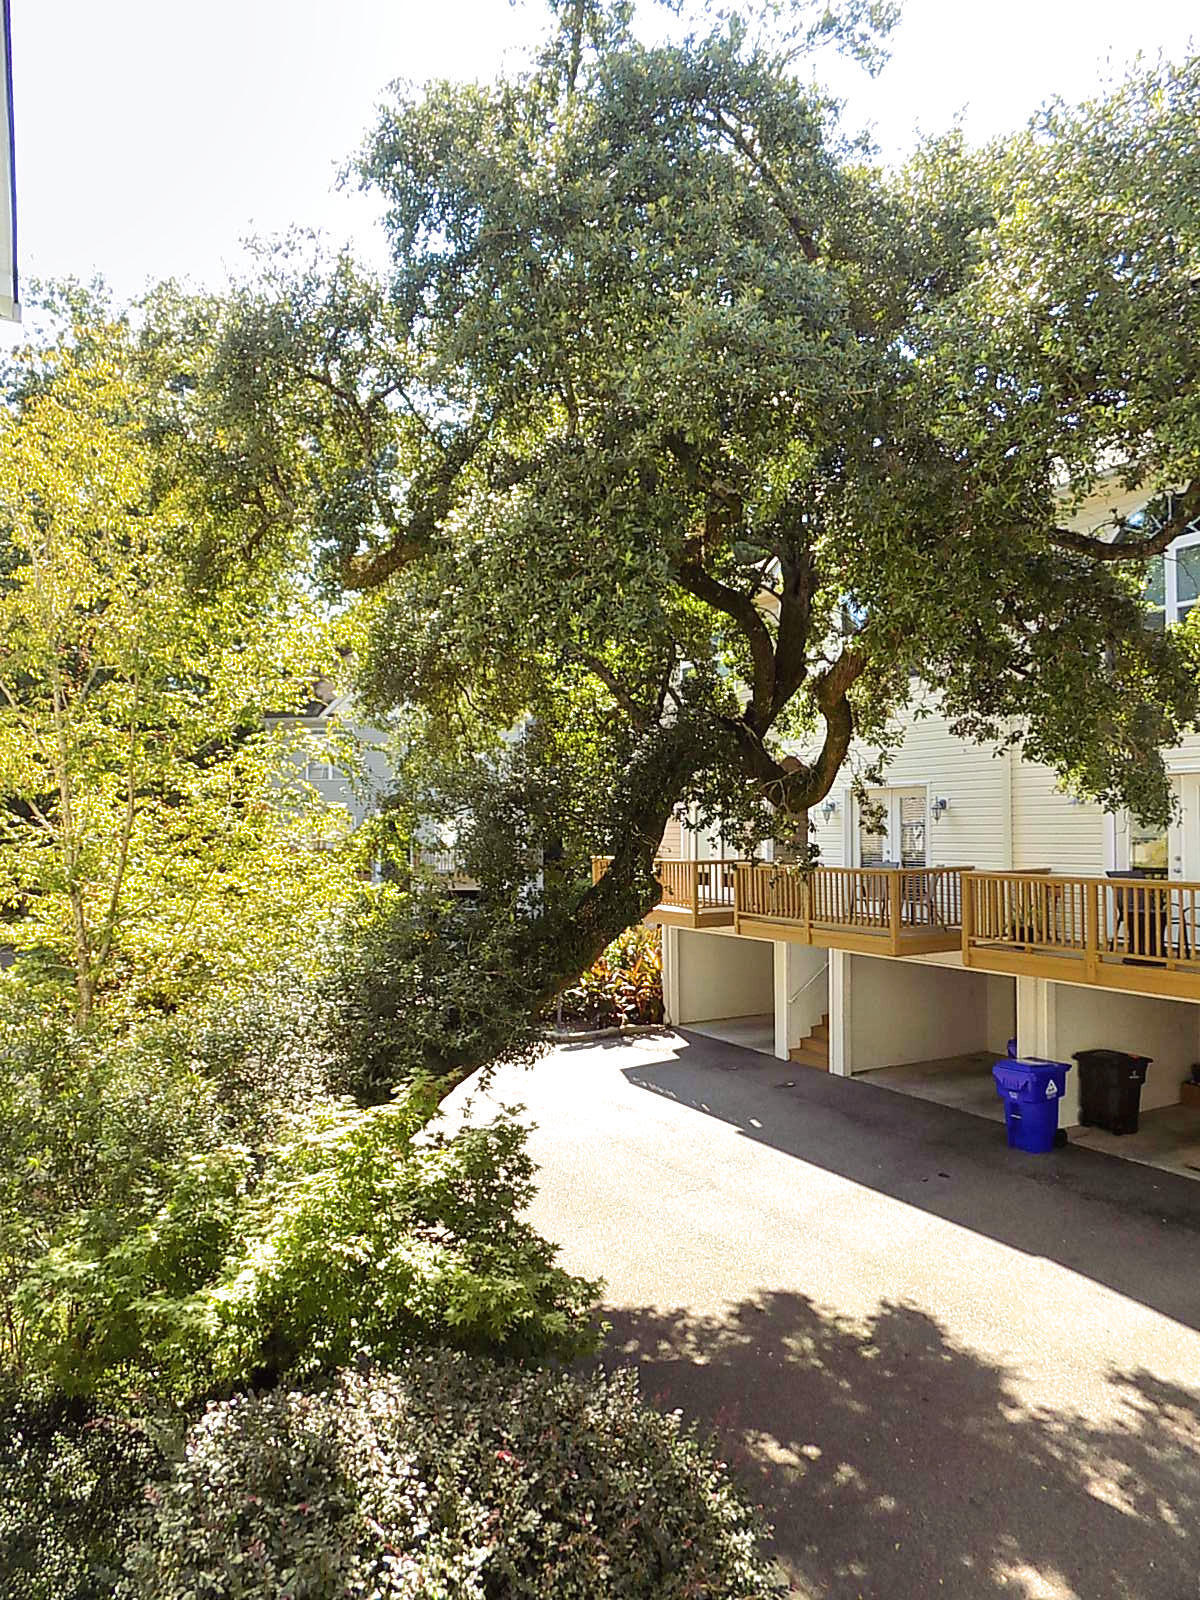 Willow Oaks Homes For Sale - 1829 Dogwood, Charleston, SC - 28